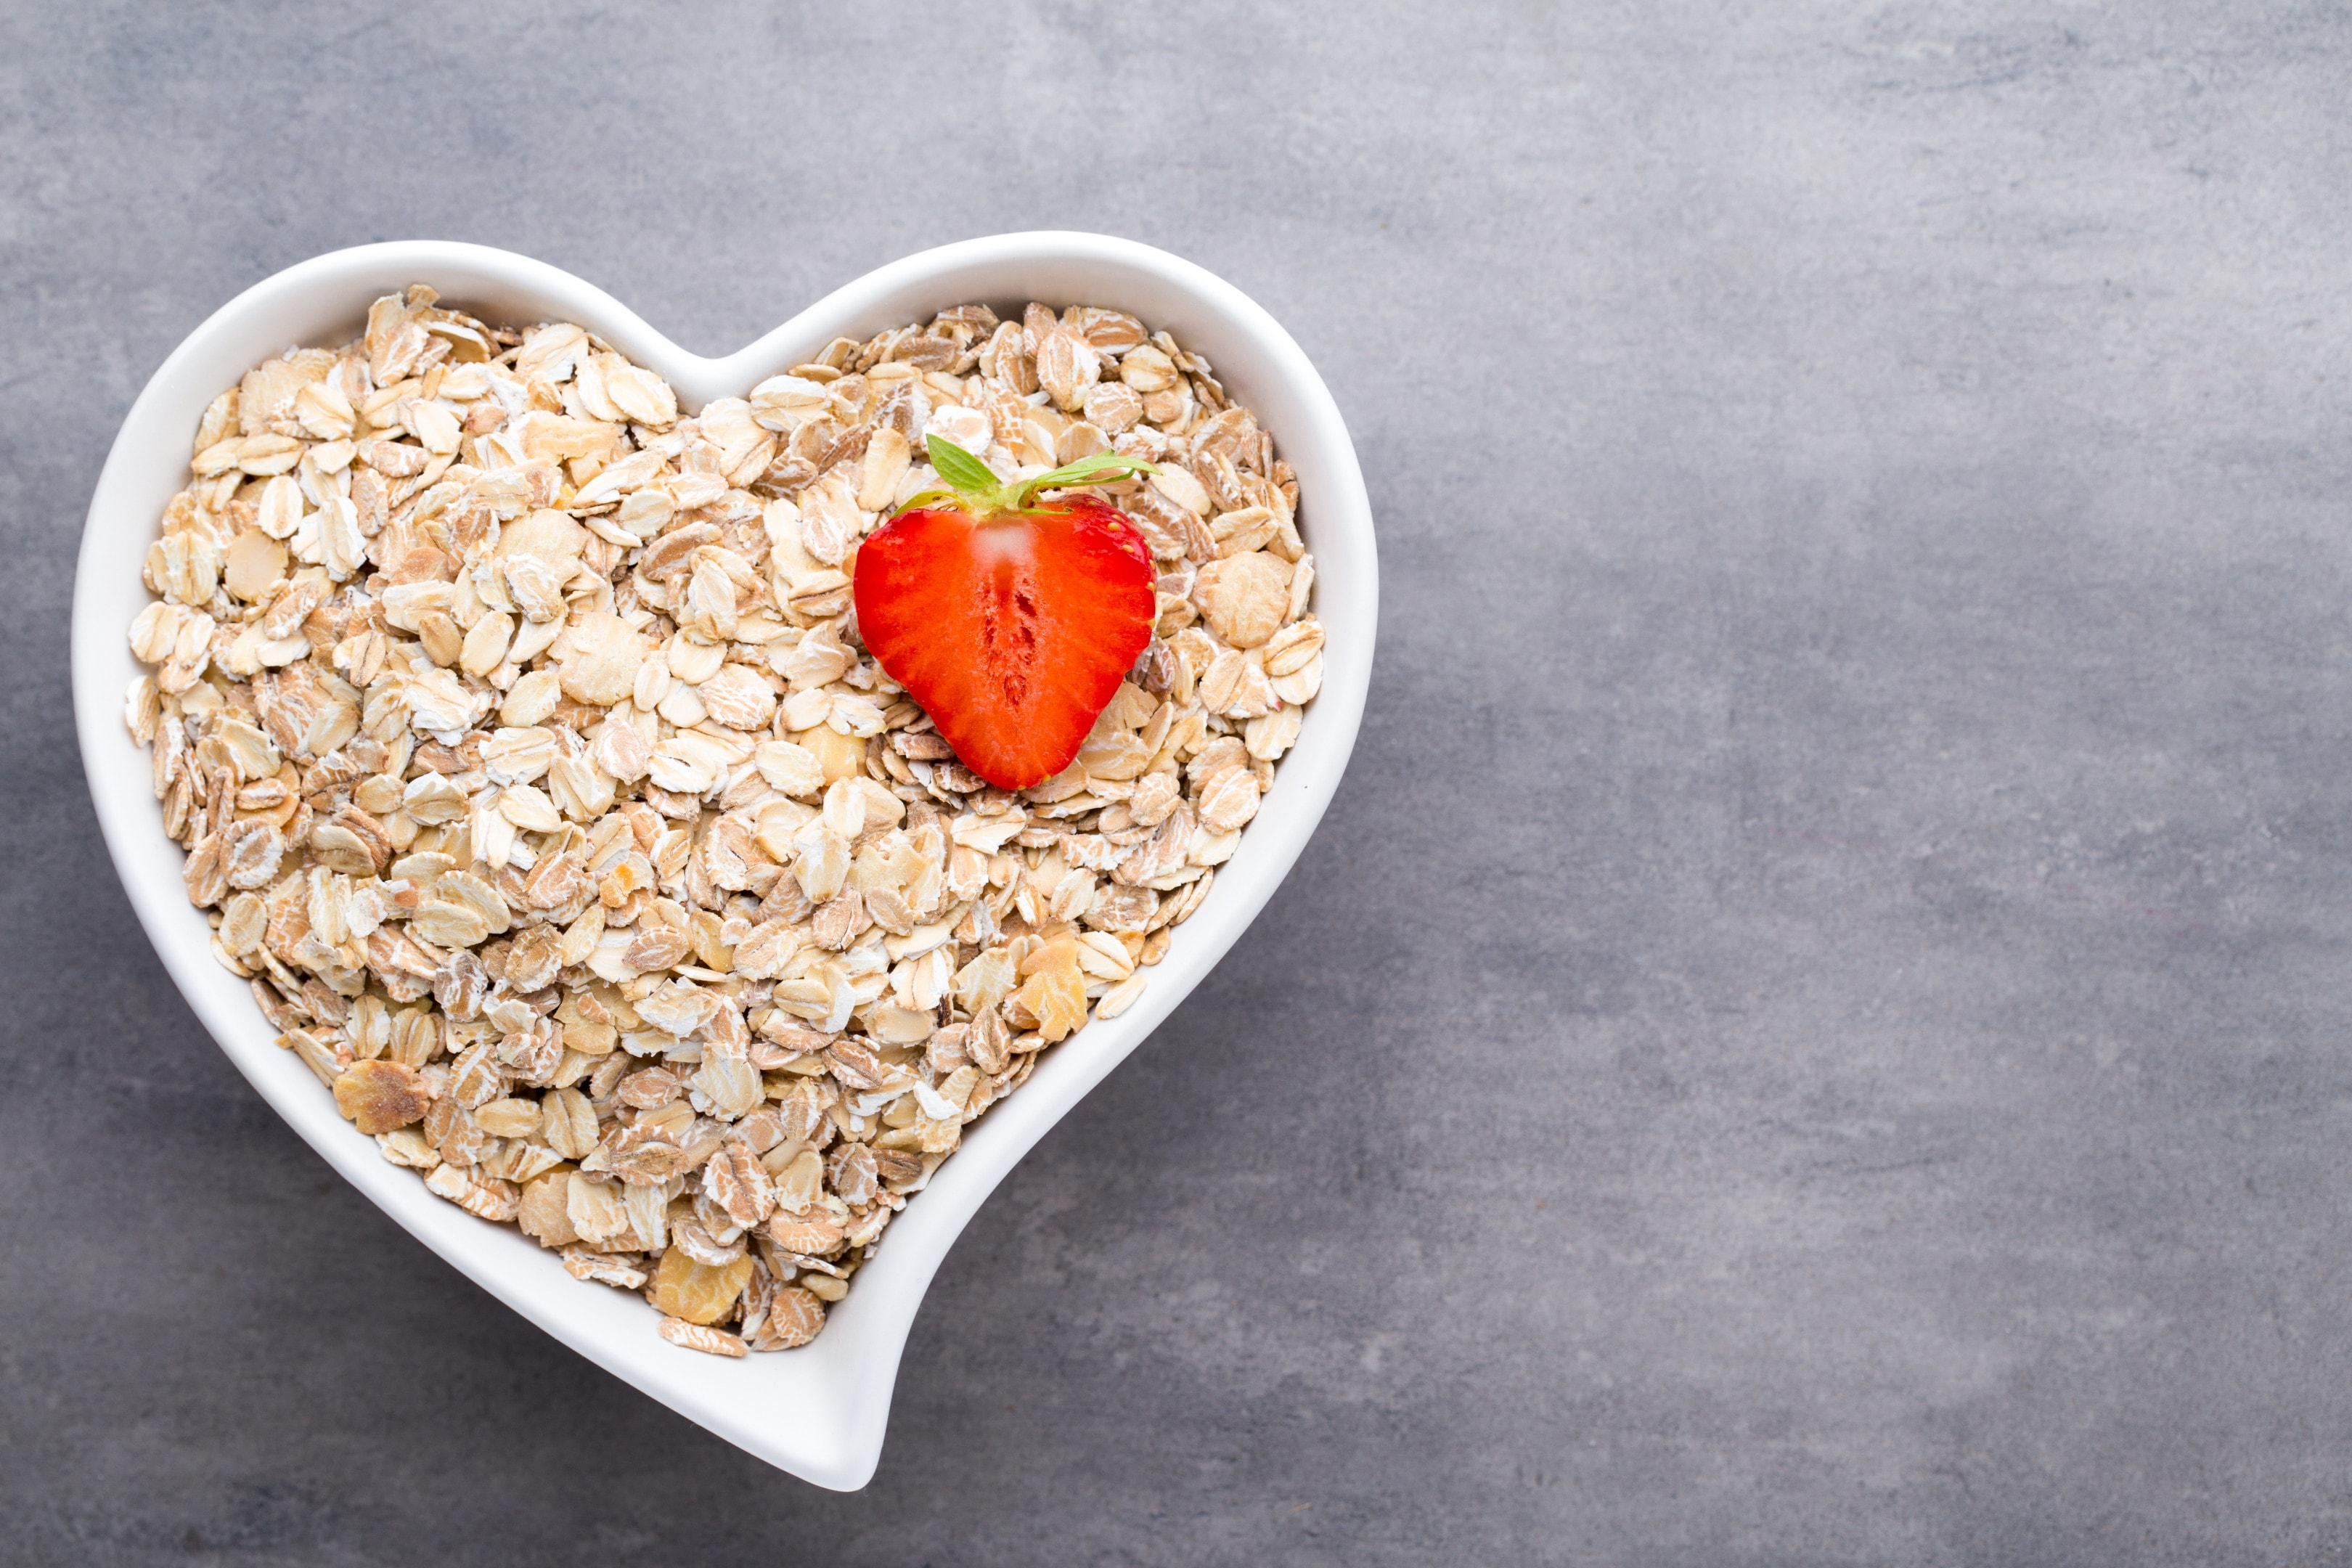 Fried oat flakes in heart shaped bowl